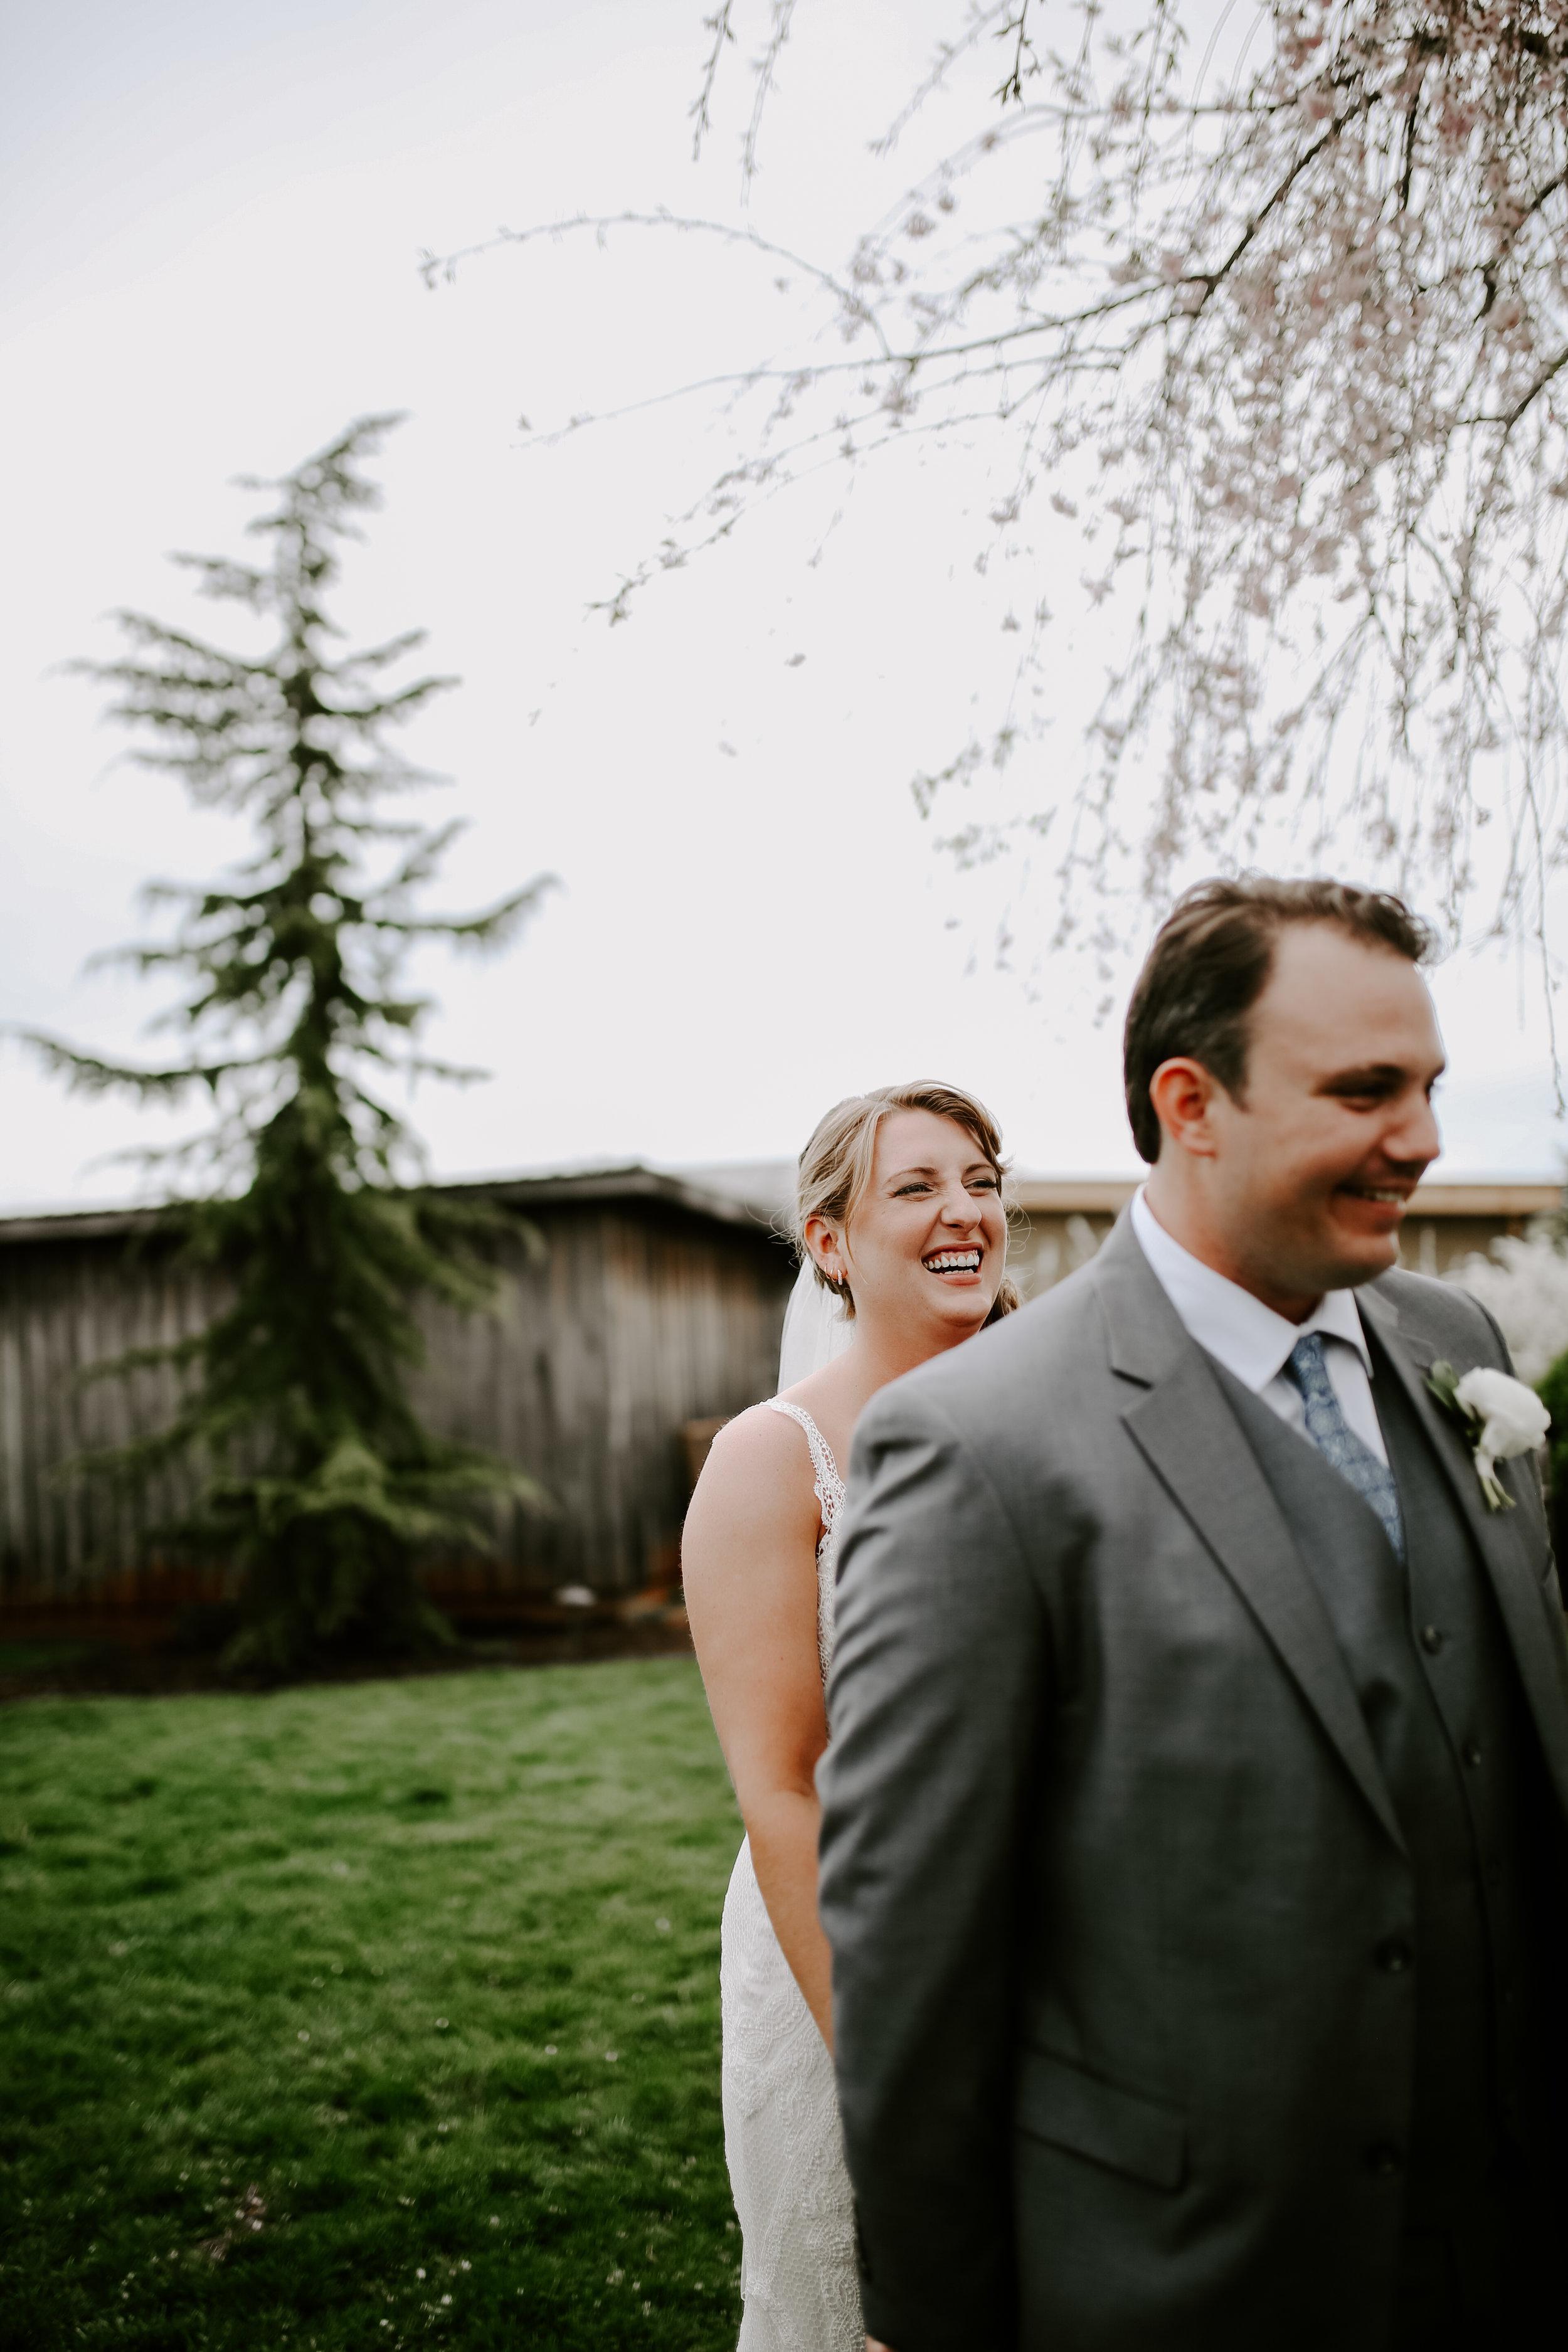 TheGreens_Married_2019-97.jpg